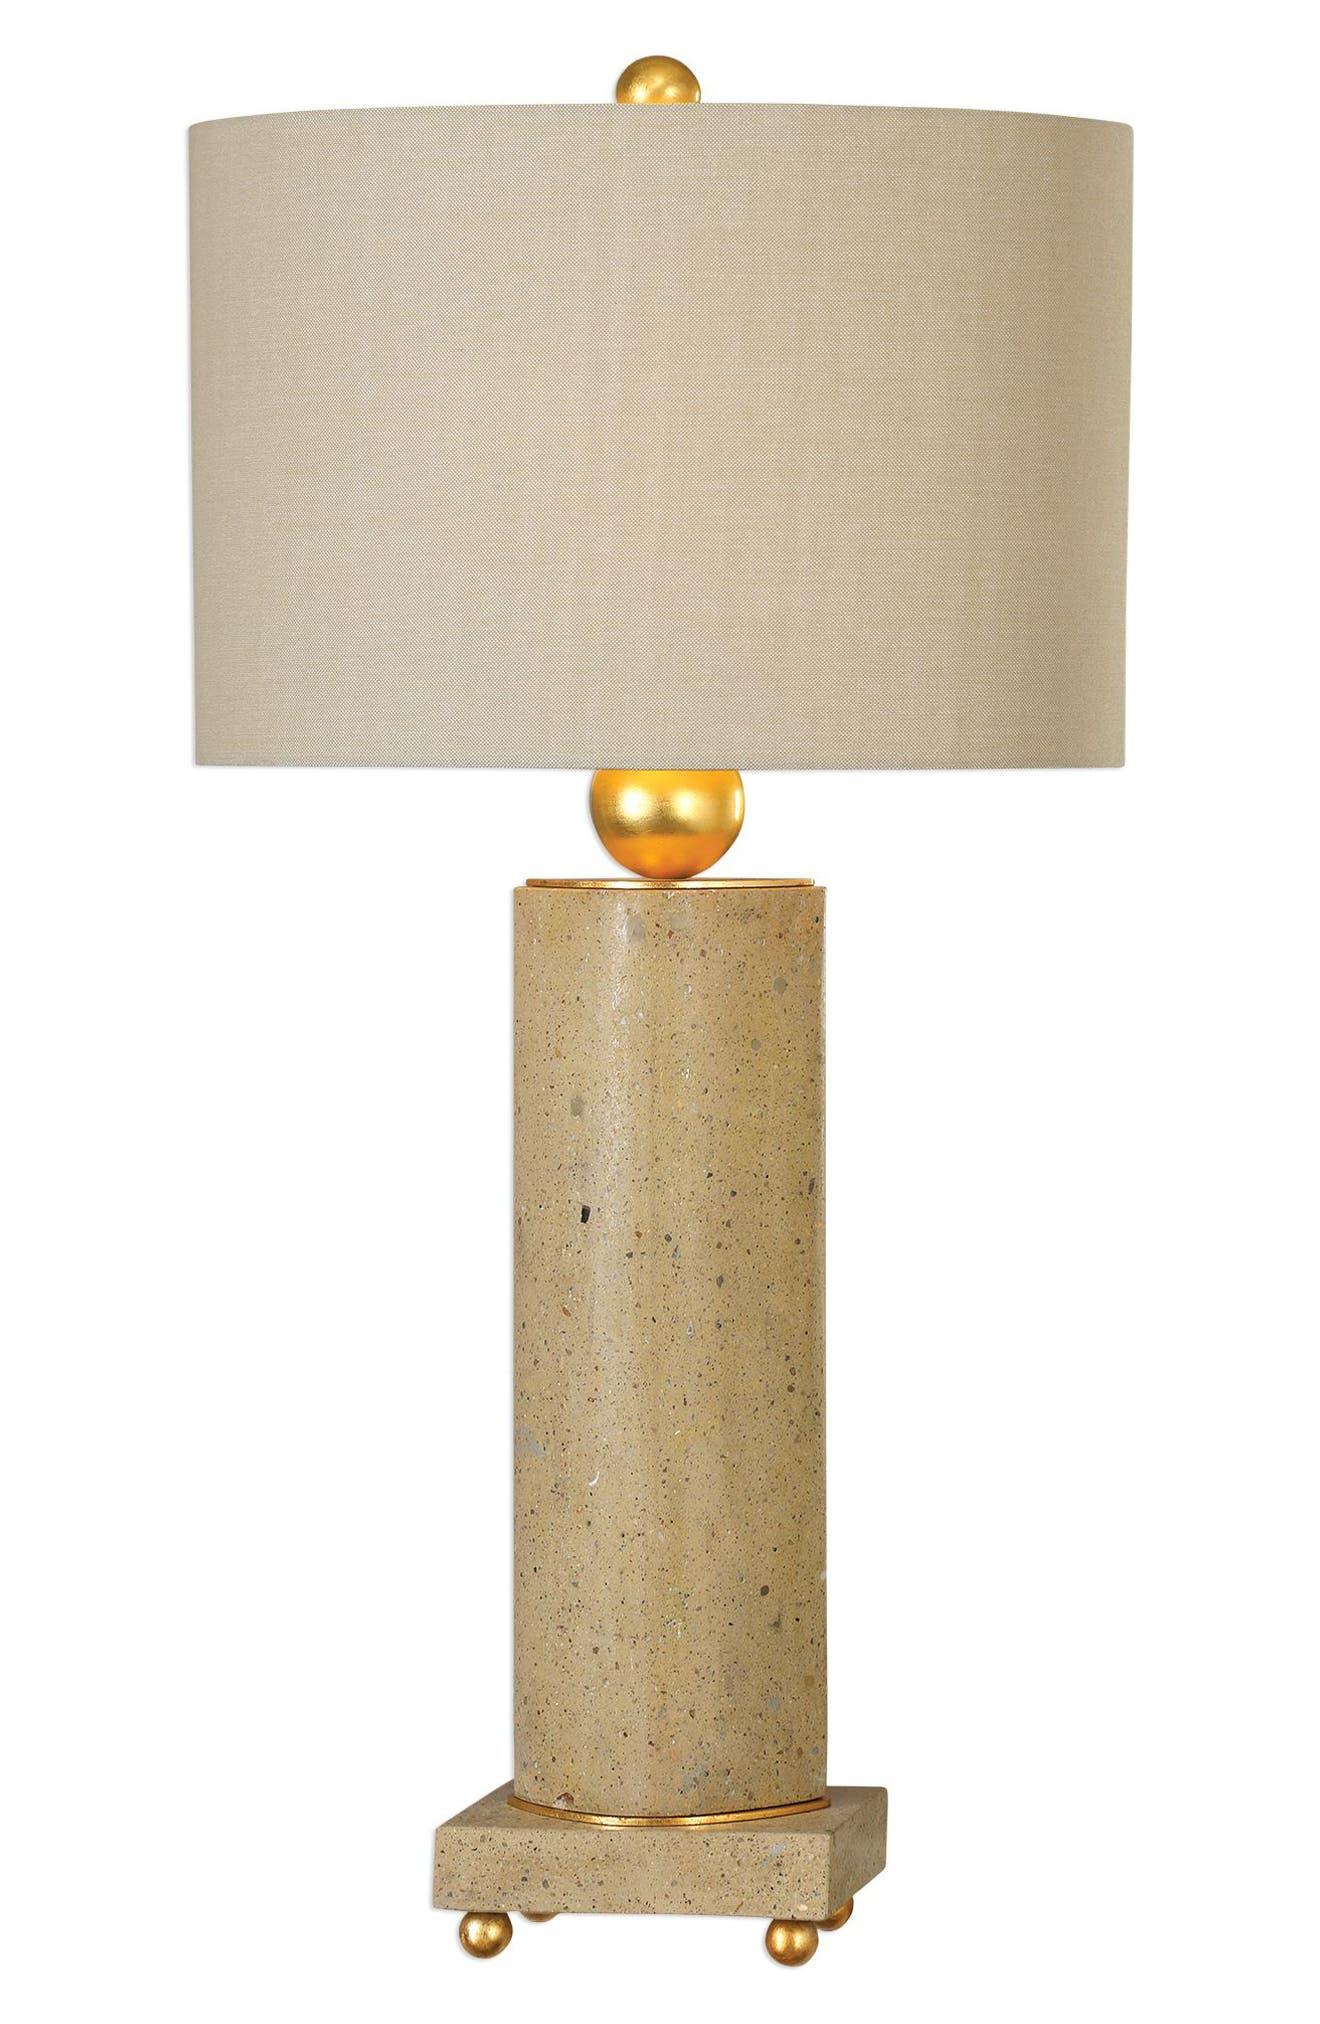 Krisel Oval Column Lamp, Main, color, STEEL W GOLD LEAF/ BEIGE SHADE